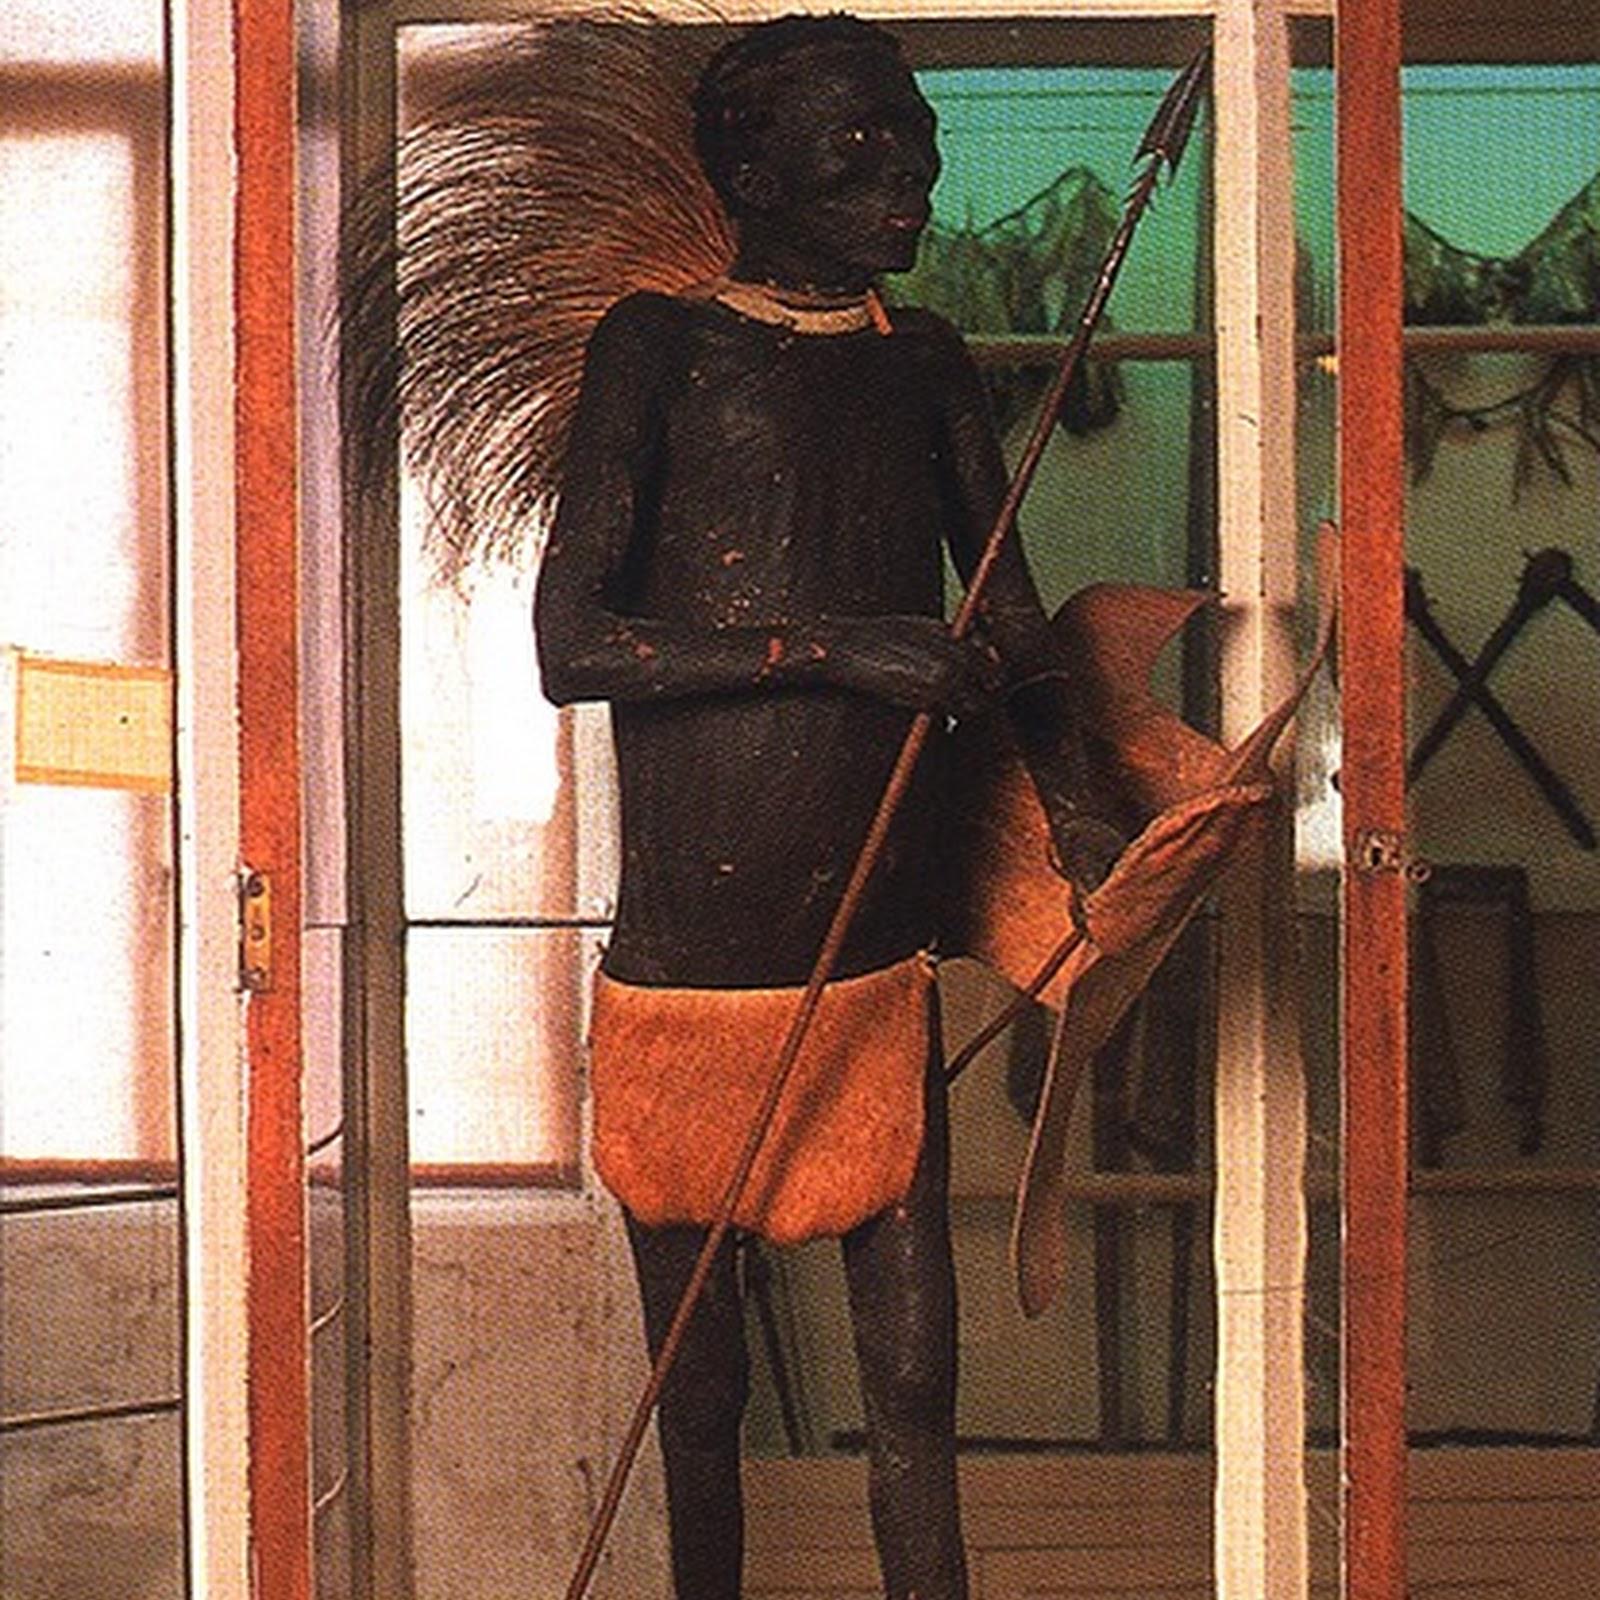 The Negro of Banyoles